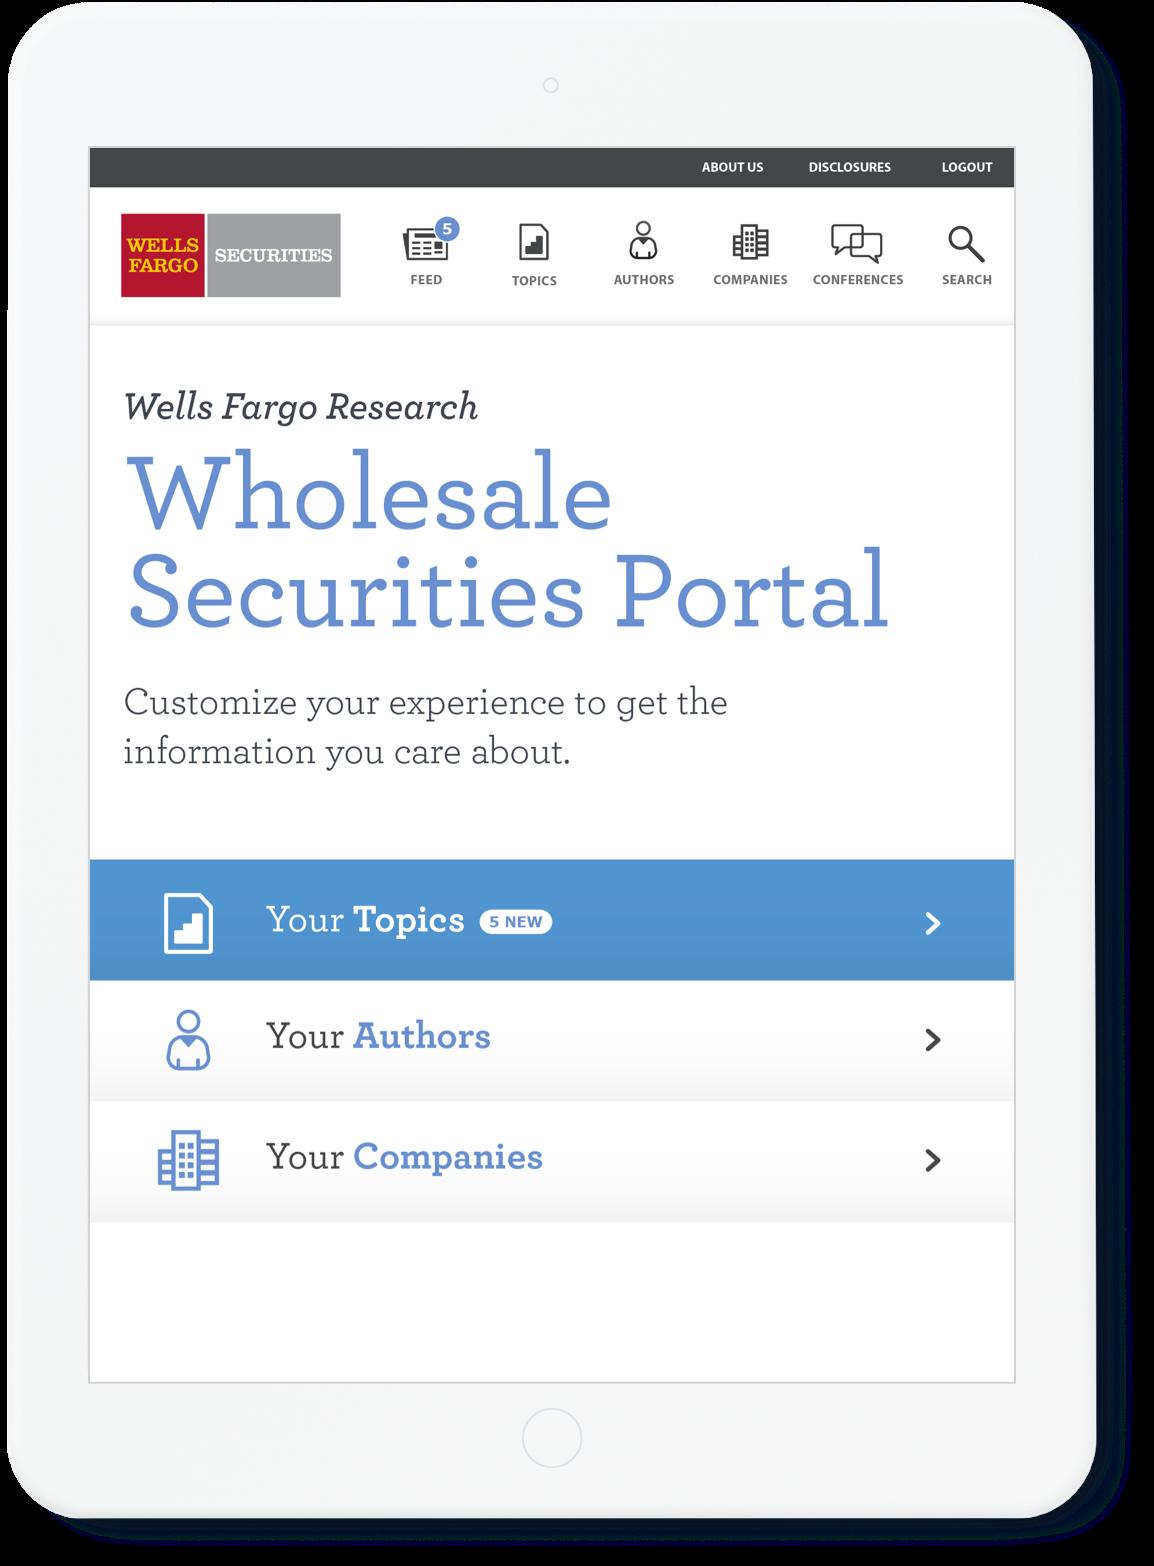 Wells Fargo Personalized Tablet Portal